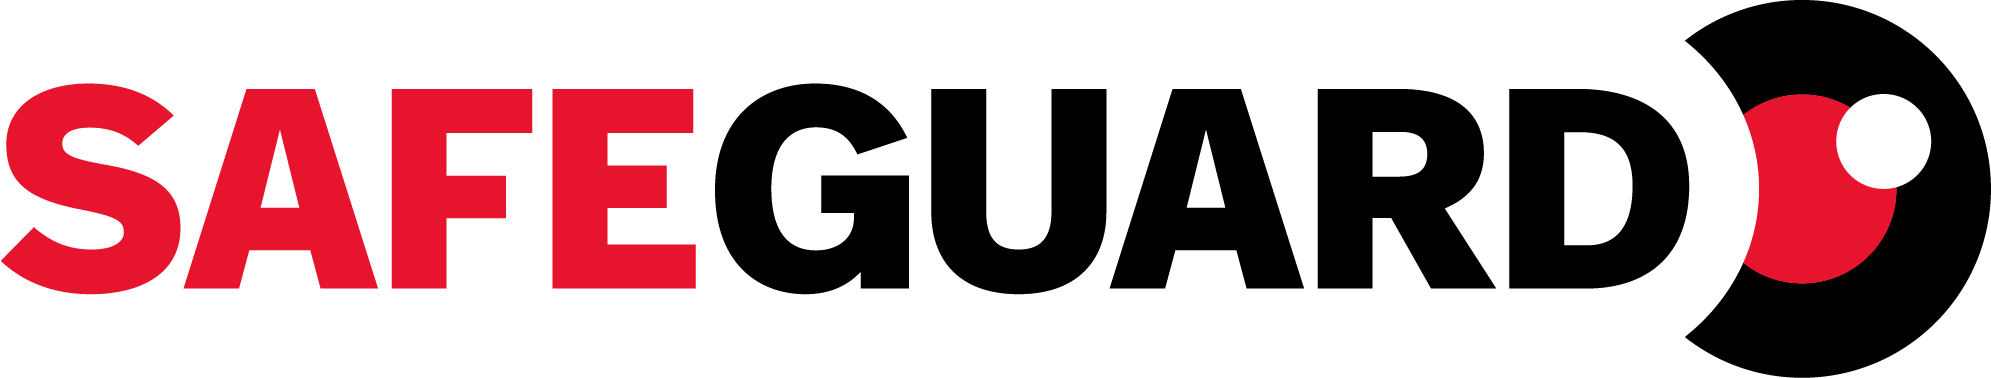 Larmbolaget SafeGuards logotyp